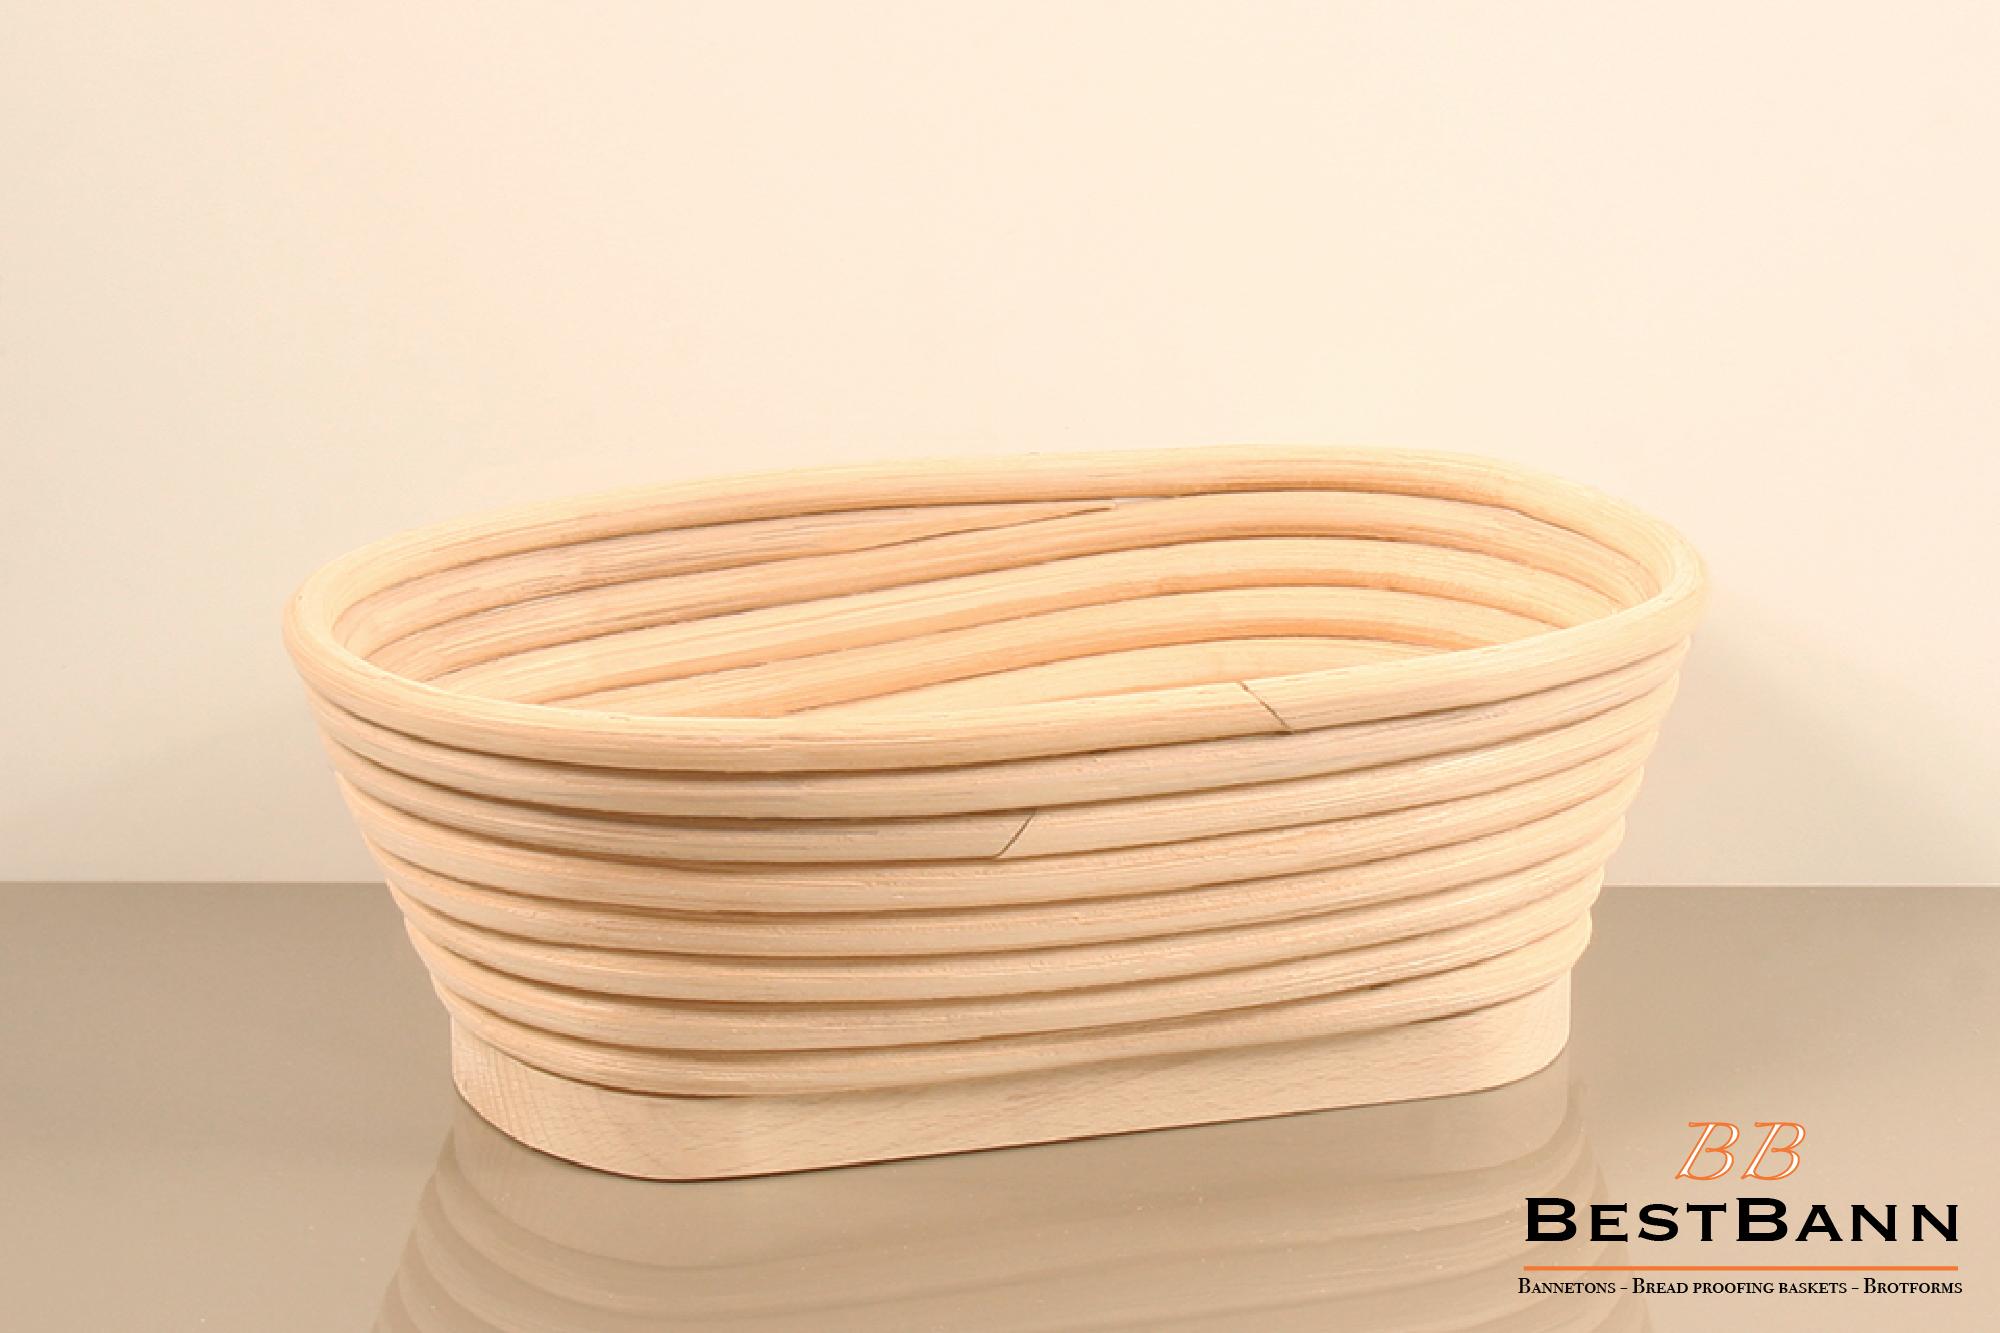 Oval 1 kg / 2,20 lb basket, wooden base BestBann Online Shop